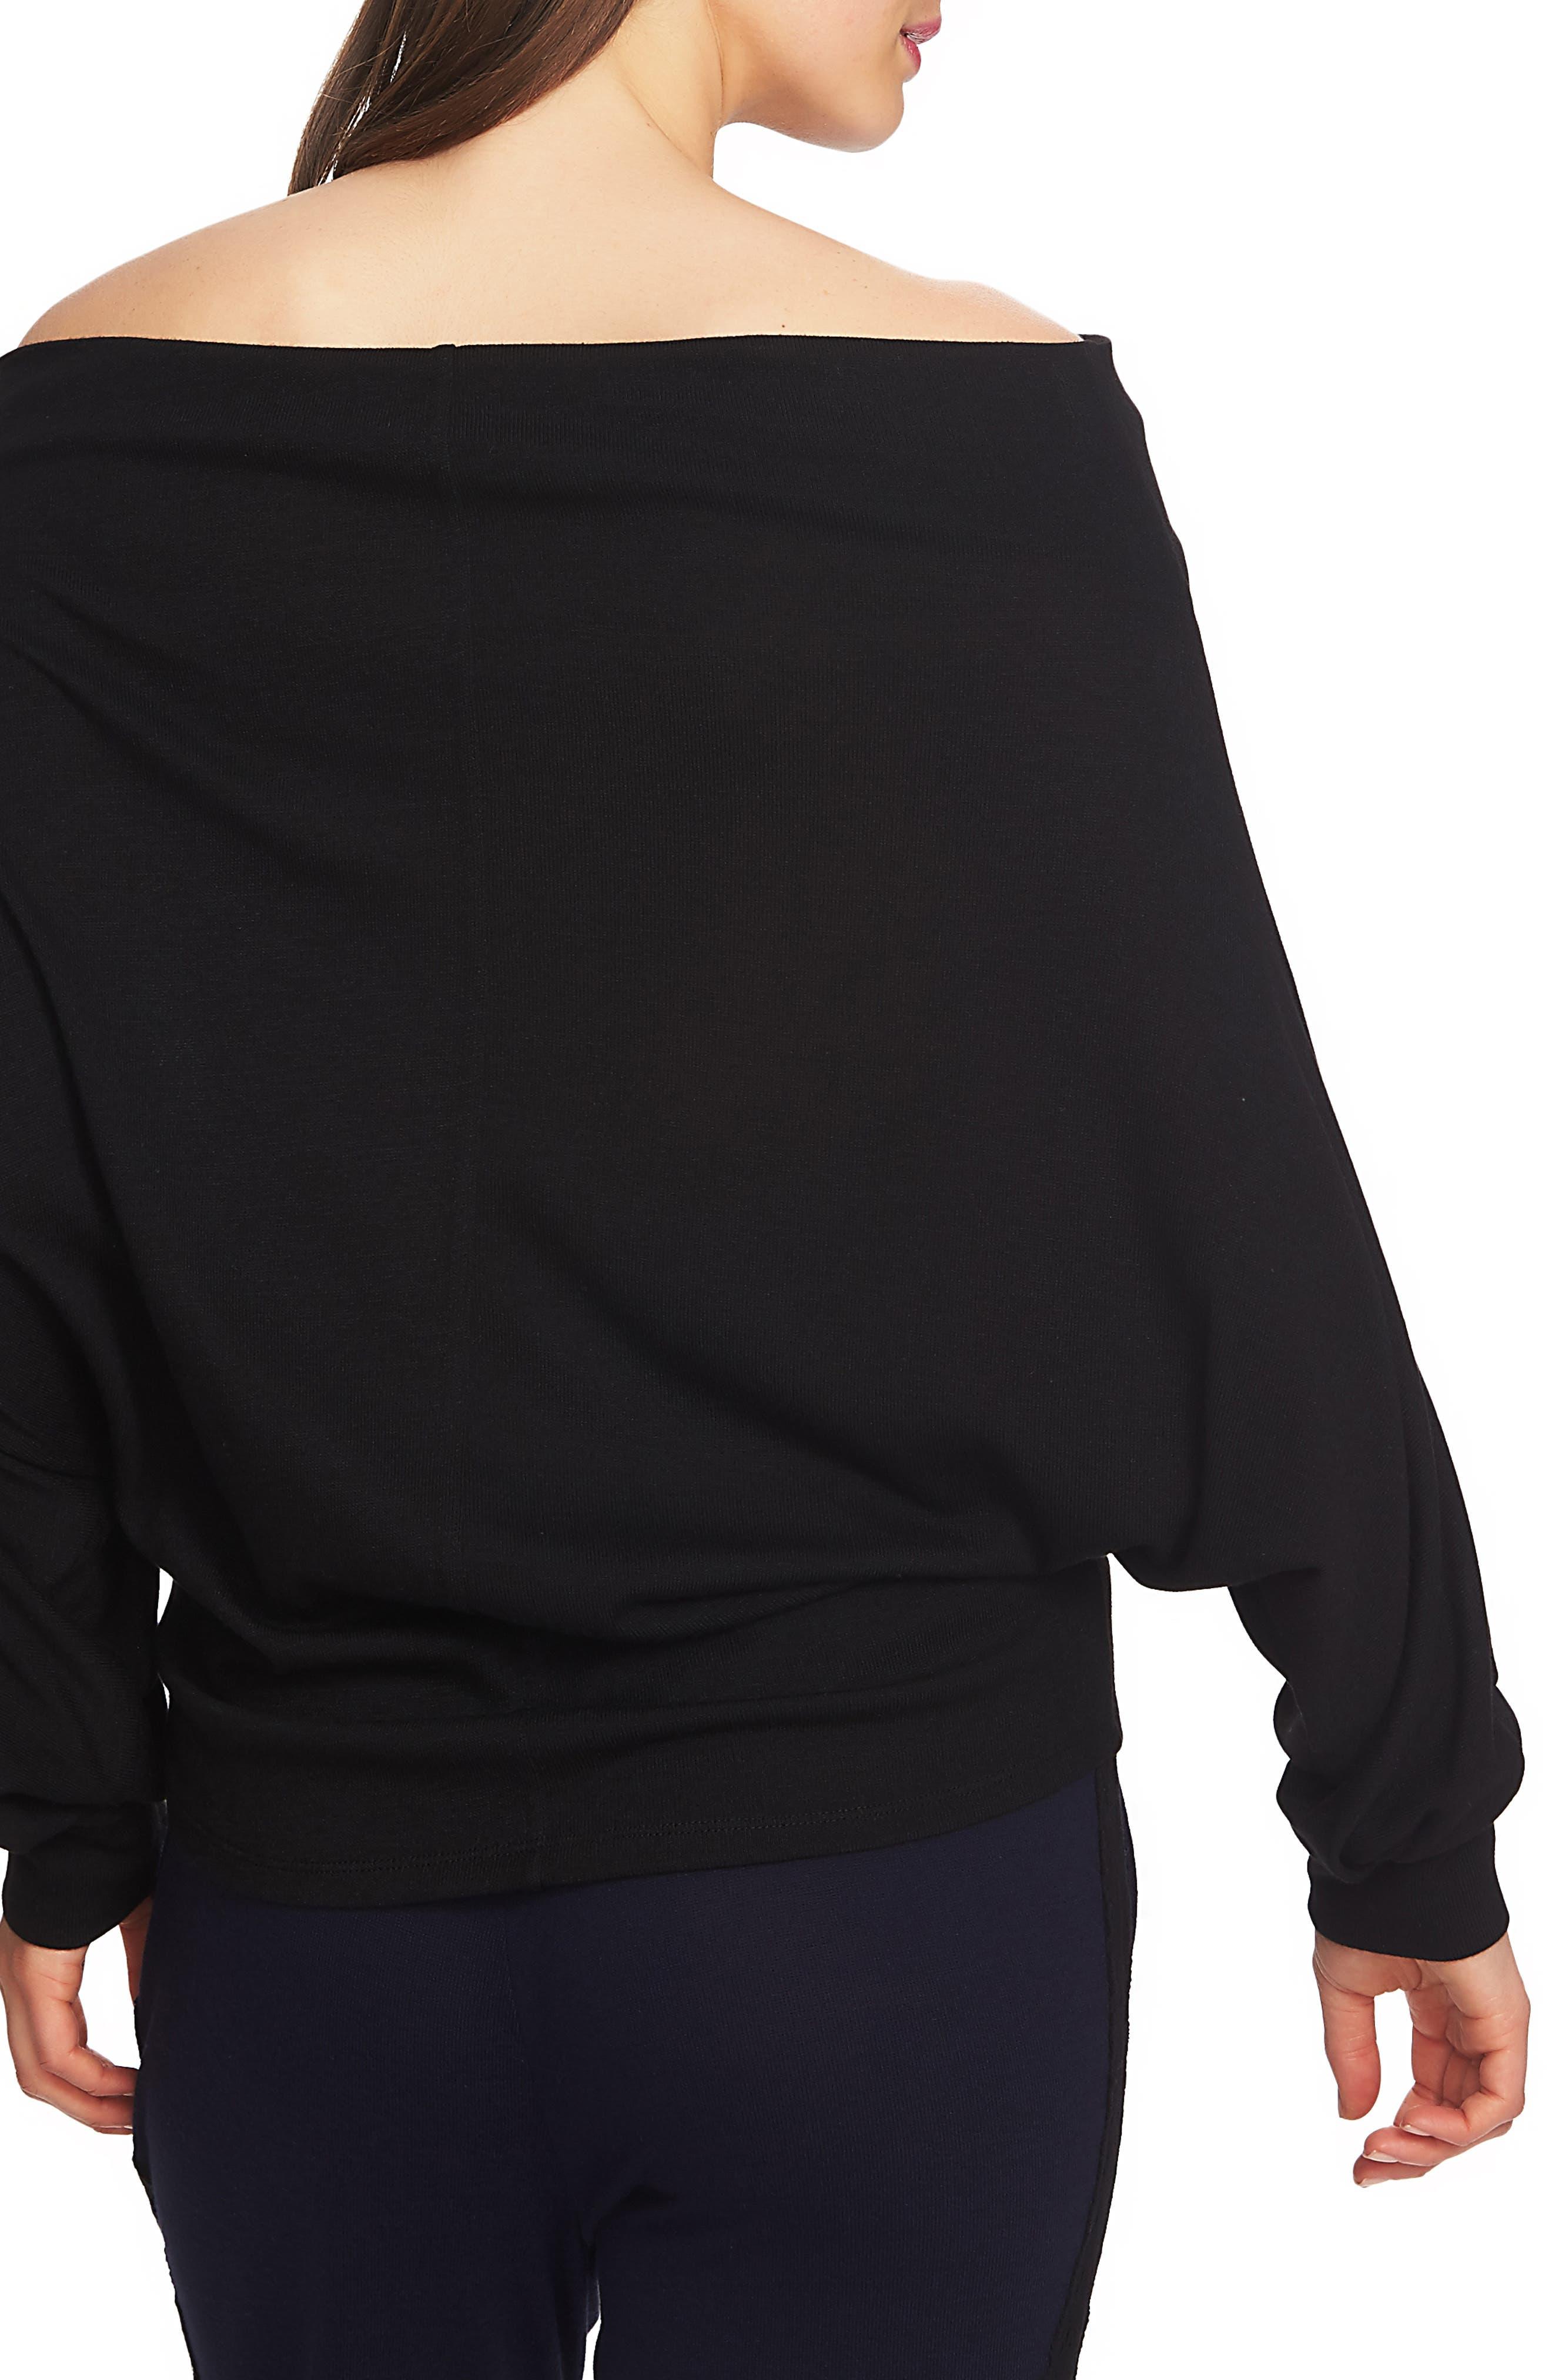 Off the Shoulder Sweater,                             Alternate thumbnail 2, color,                             RICH BLACK